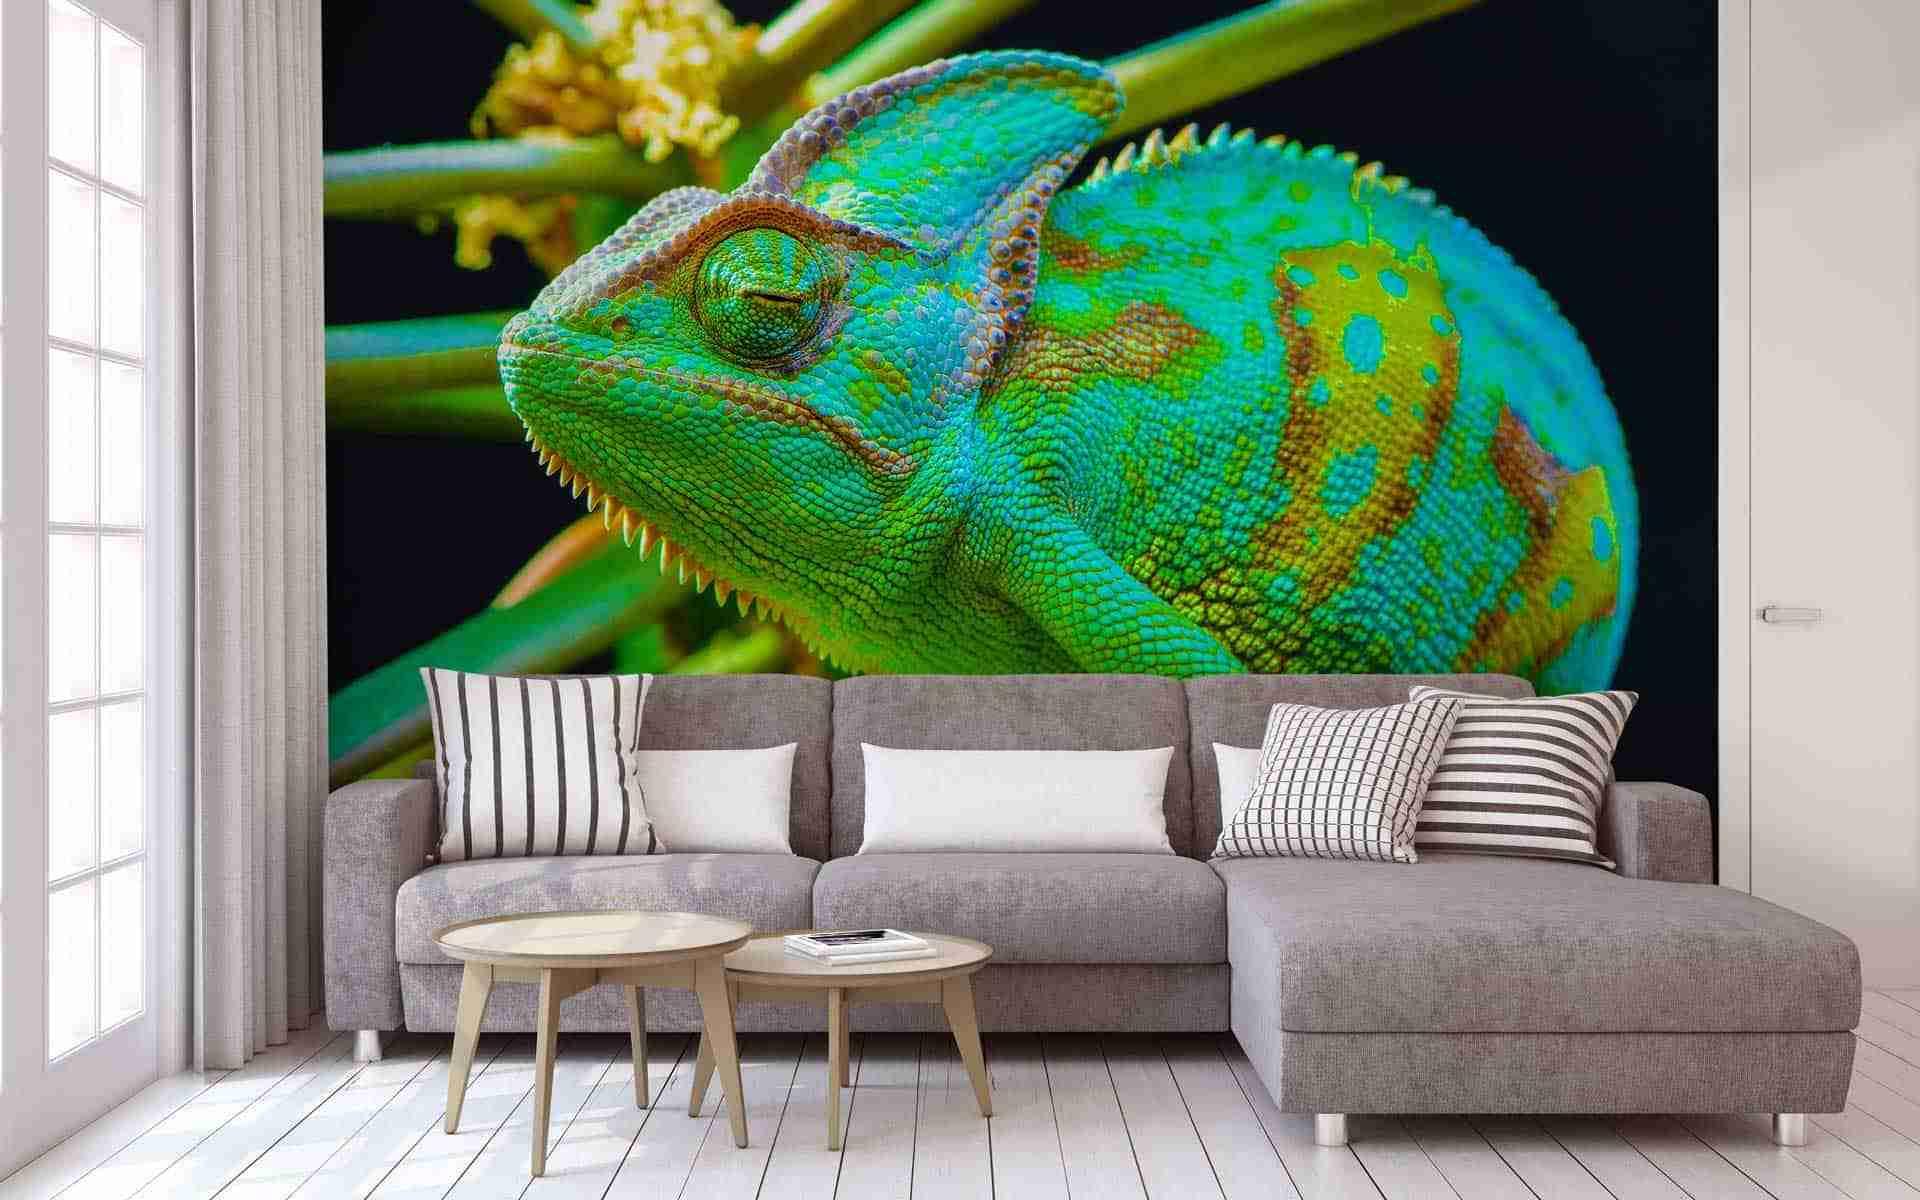 chameleon-wallpaper-getitprinted.com-